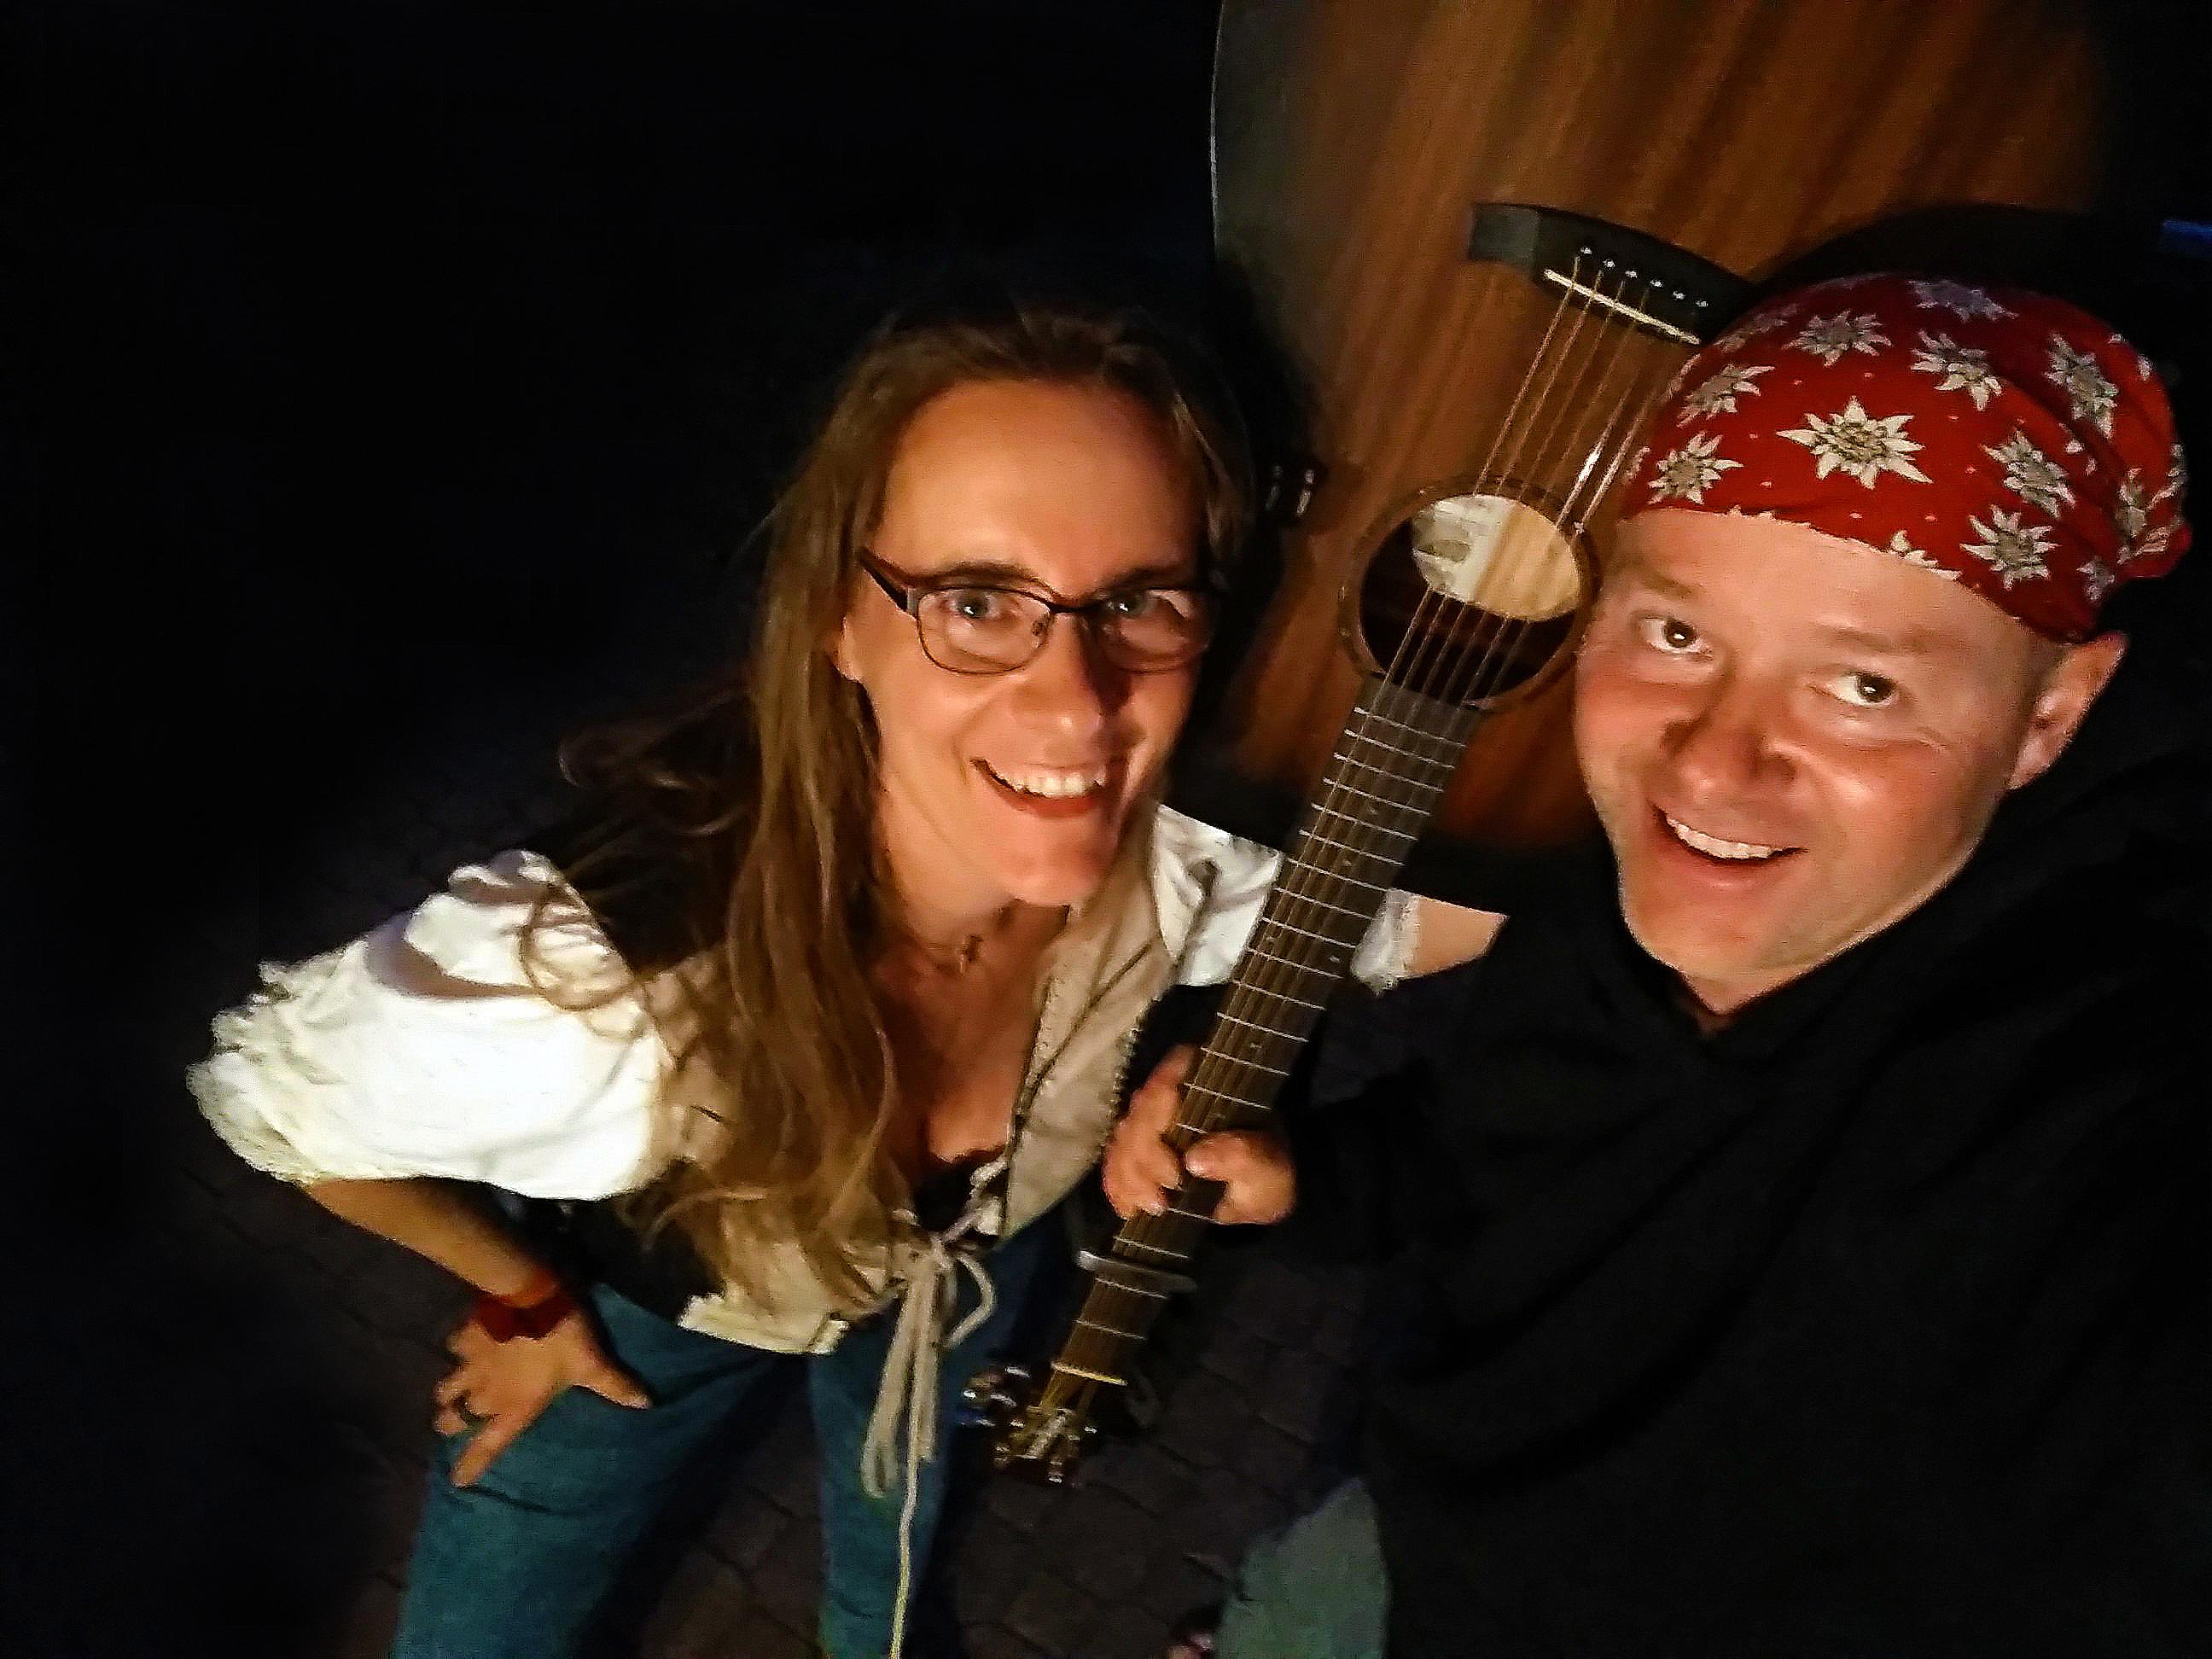 Concert: Linus (FetzMusik) & Rosina Casty